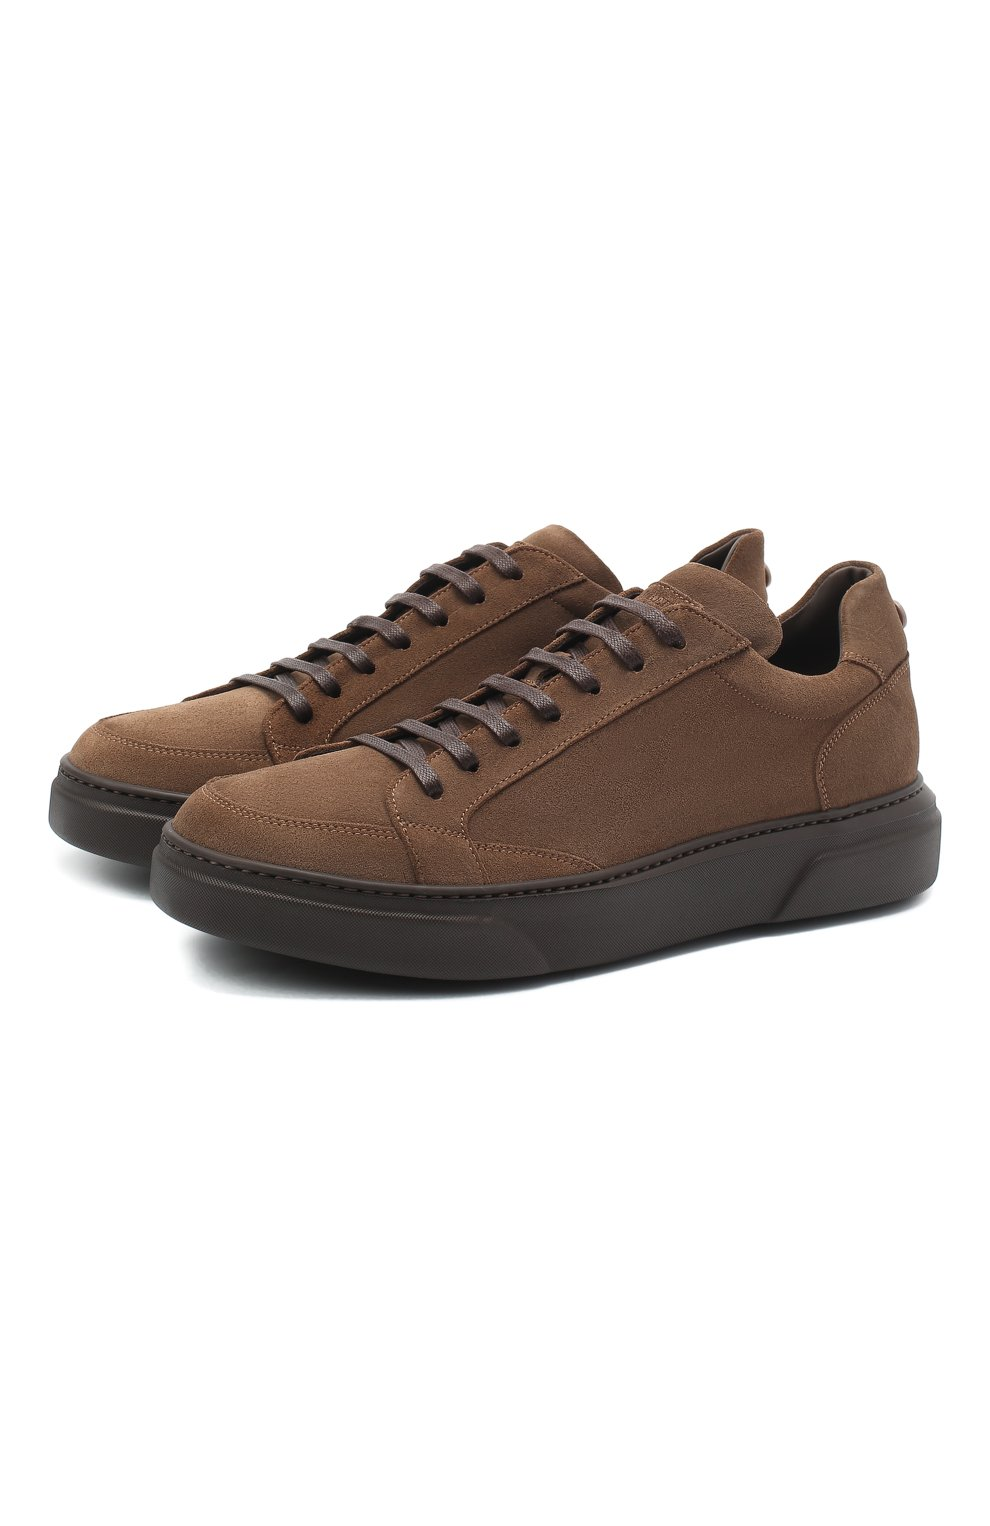 Мужские замшевые кеды BARRETT коричневого цвета, арт. PHAN-10993.10/REPELL0 0IL   Фото 1